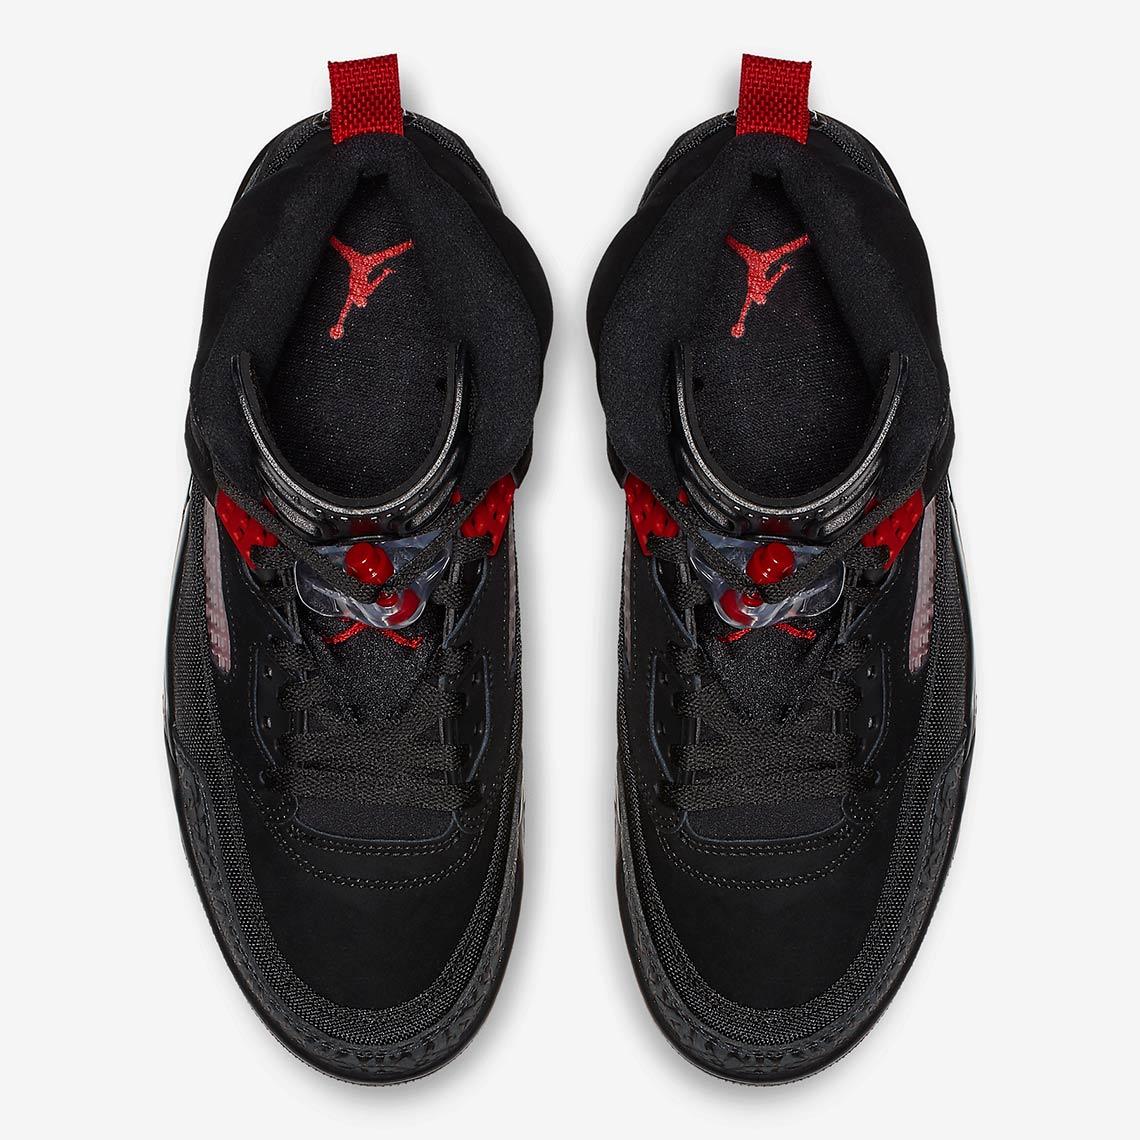 half off 59fc3 dafa1 Jordan Spiz ike Black + Red 315371-001 Photos   SneakerNews.com